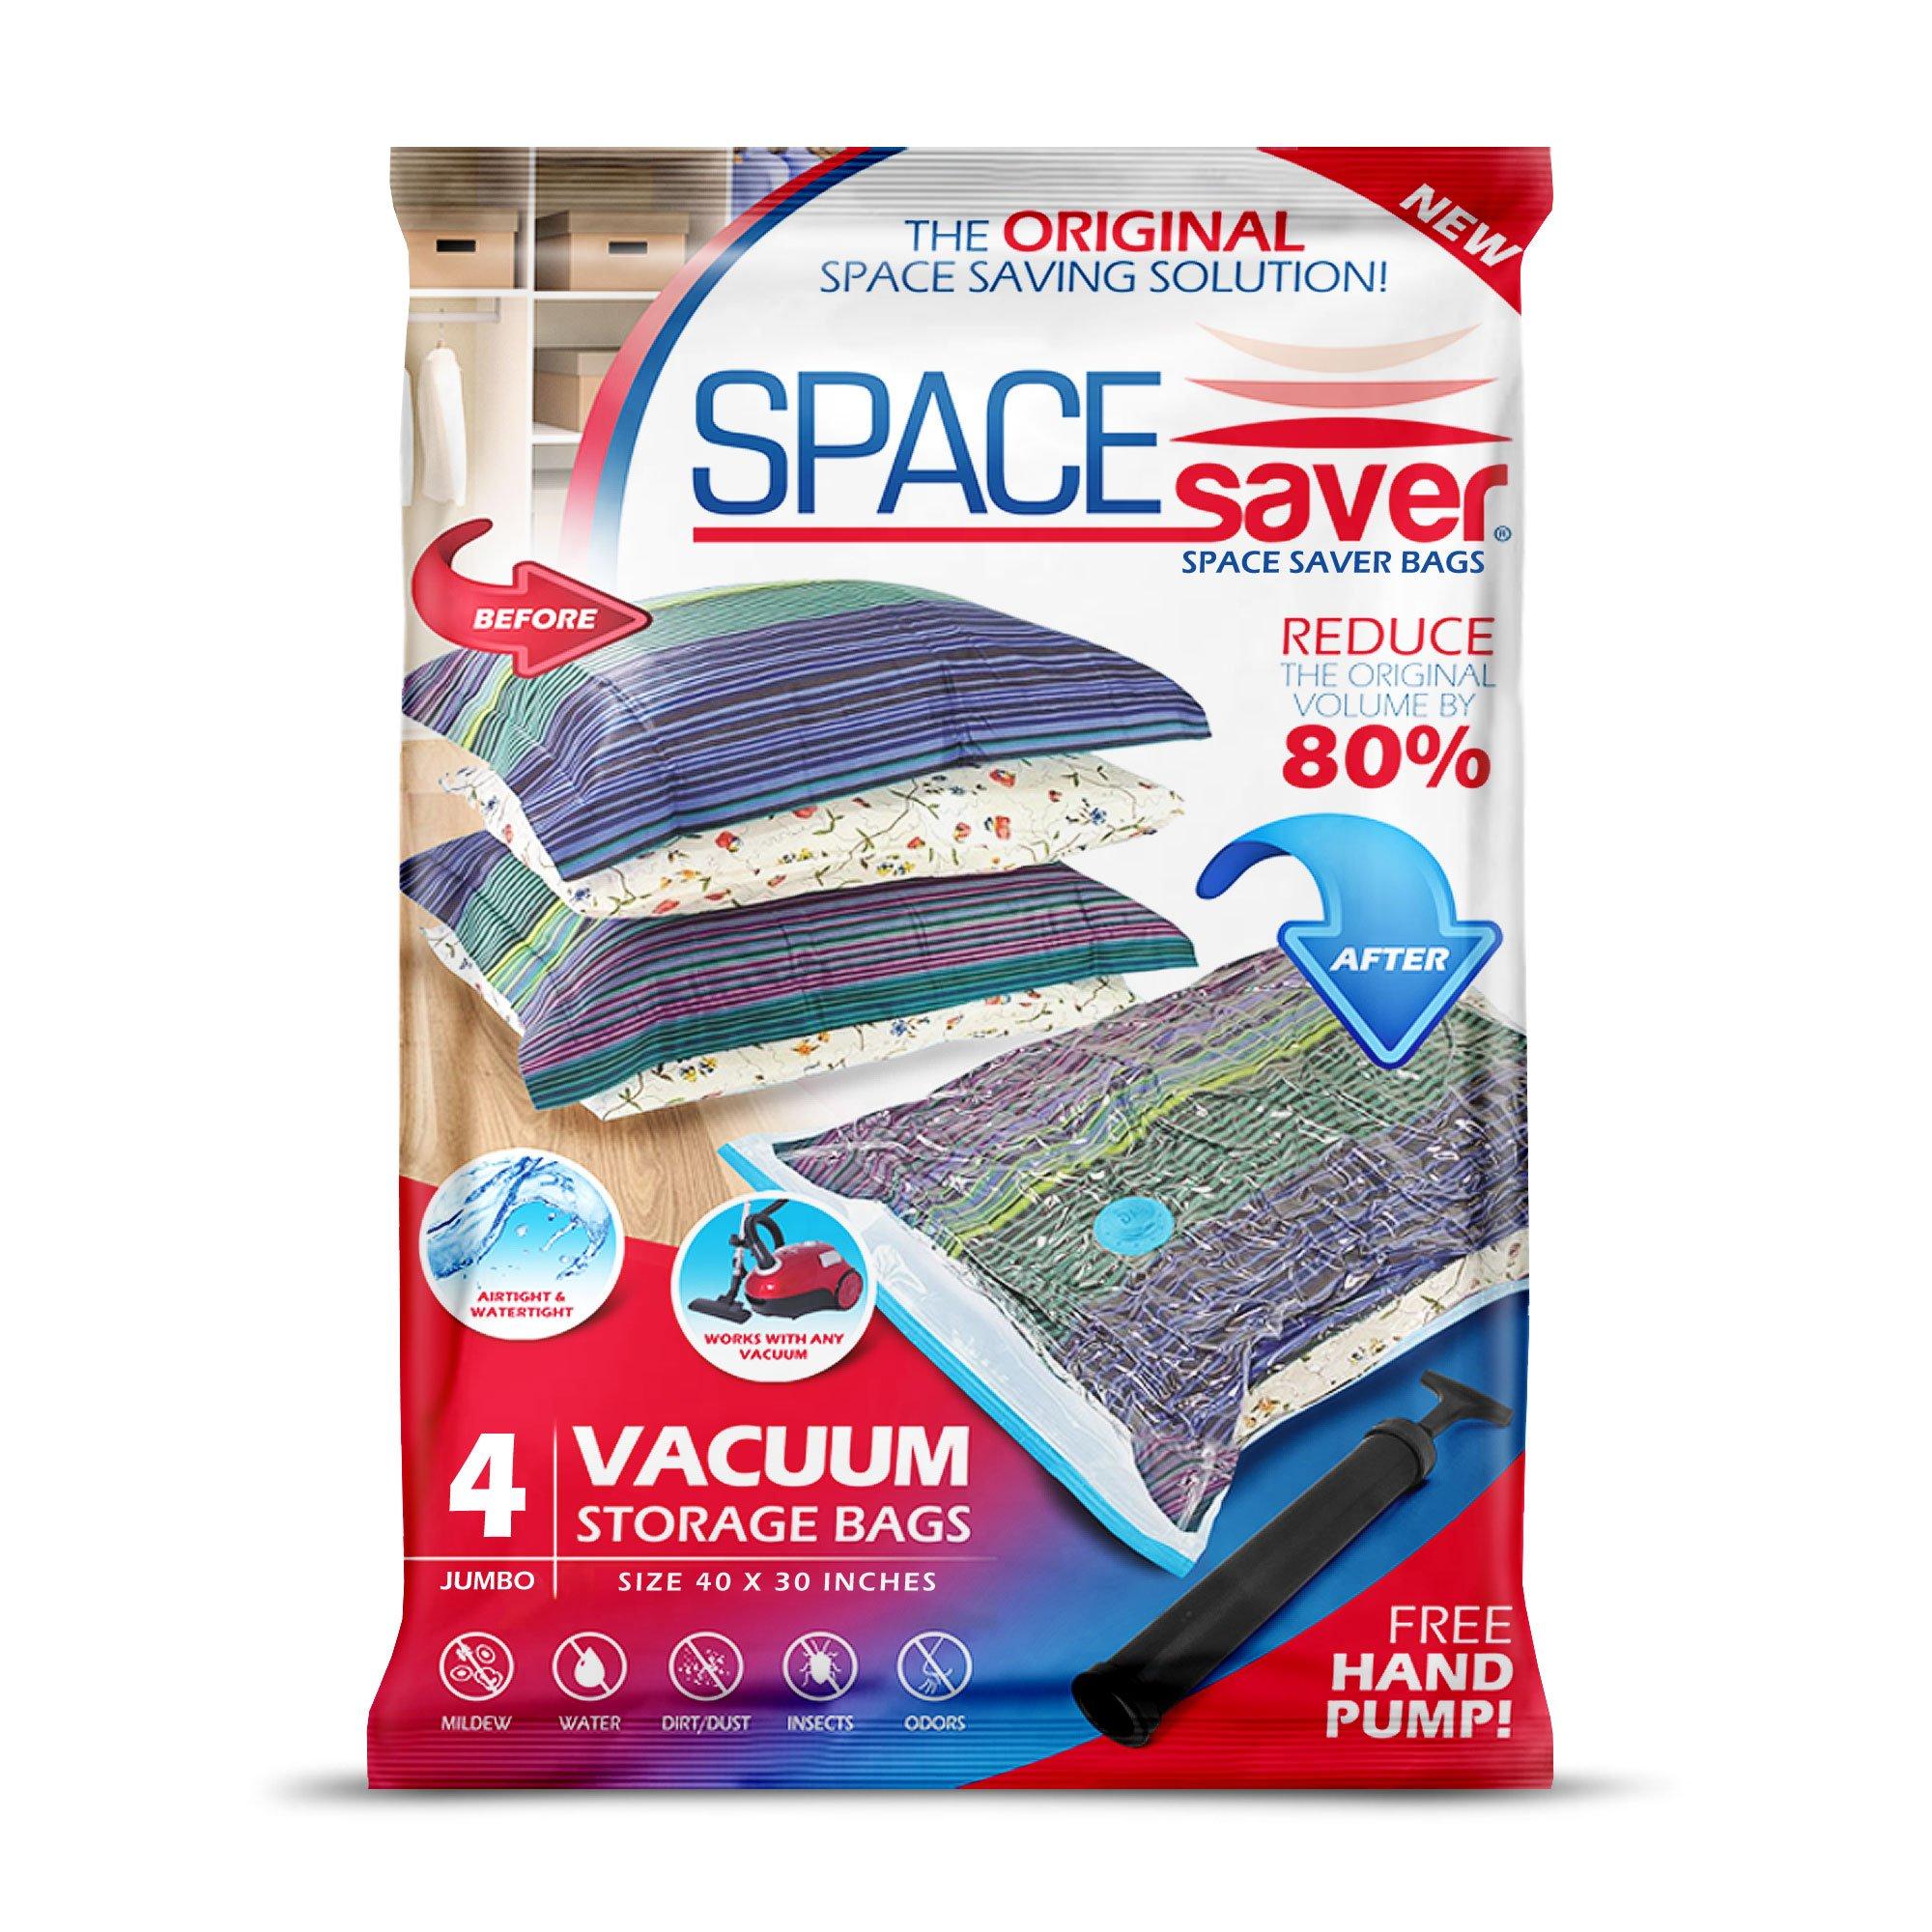 Space Saver Premium Reusable Vacuum Storage Bags (Jumbo 4 Pack), Save 80% More Storage Space. Double Zip Seal & Leak Valve, Travel Hand Pump Included